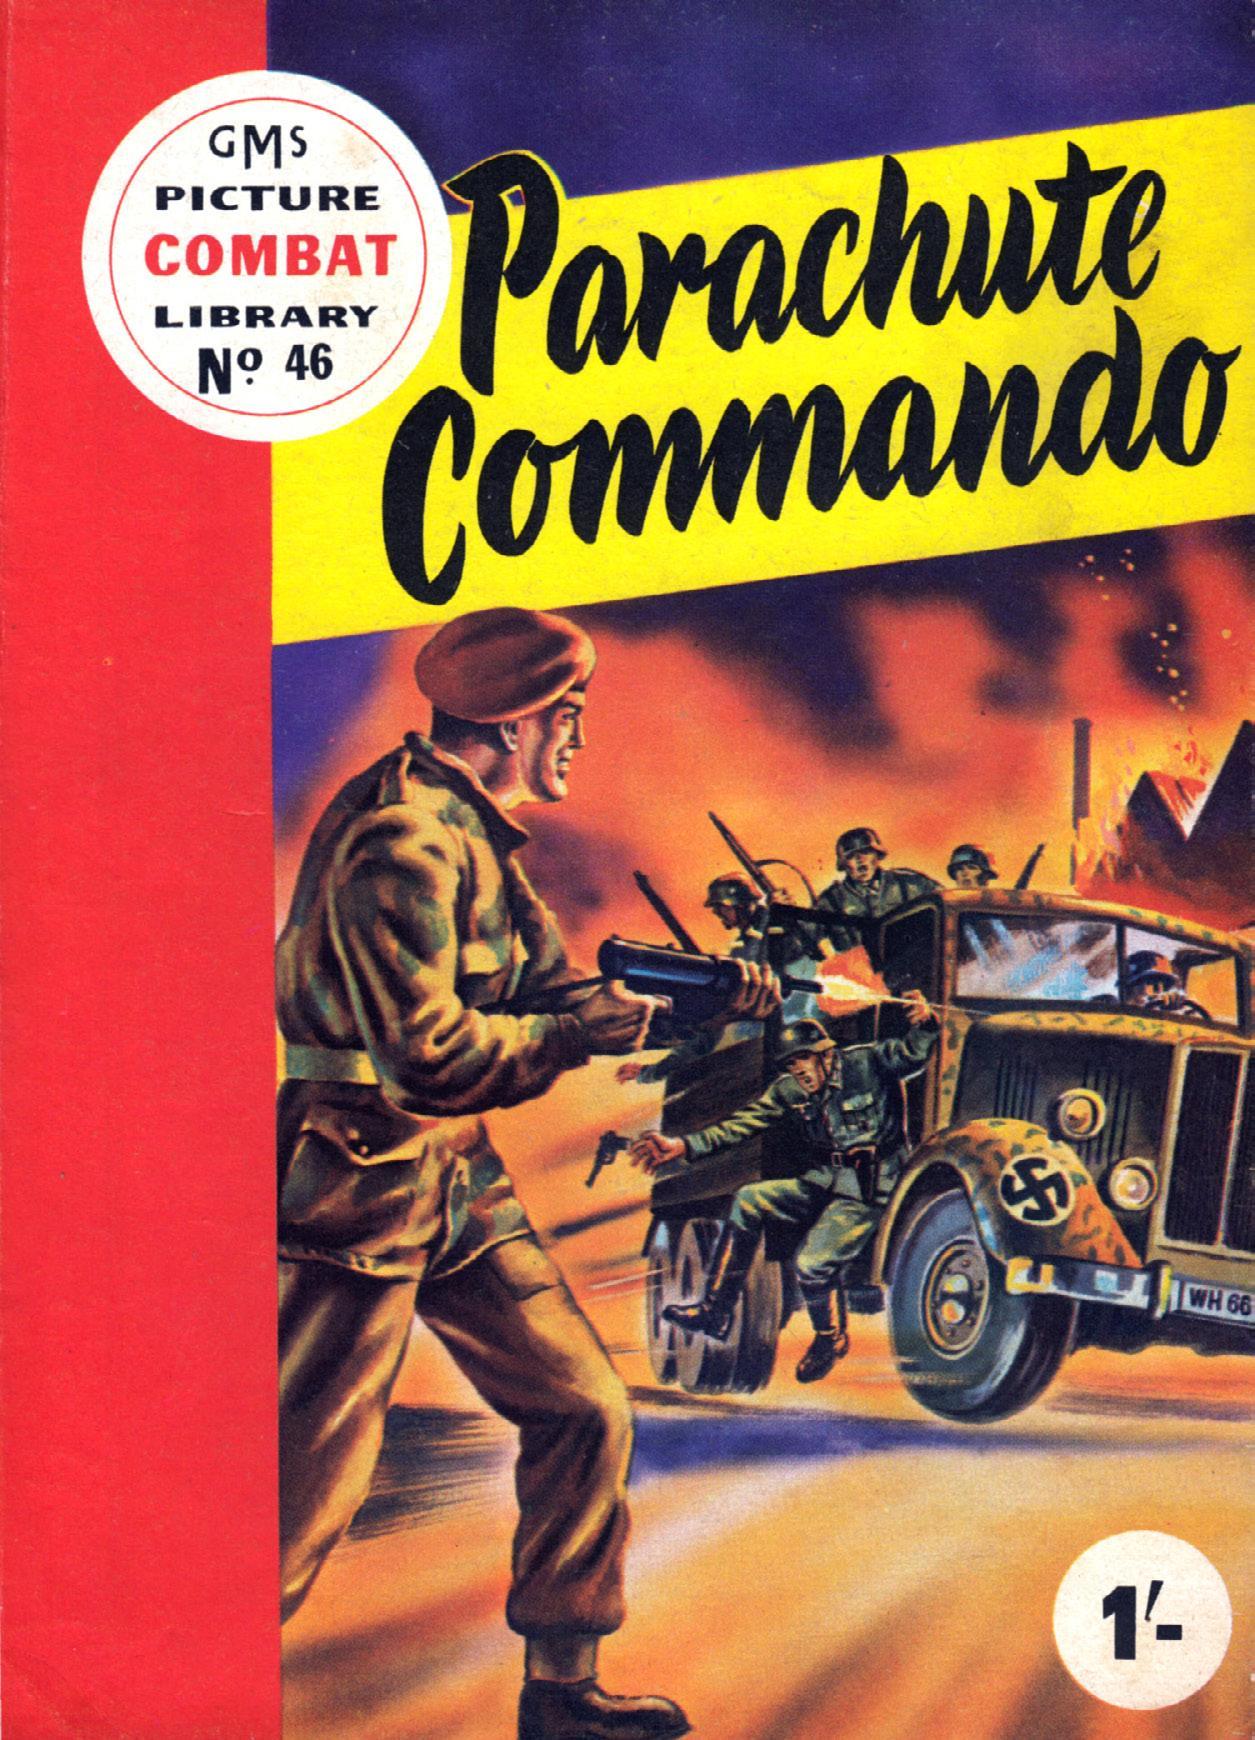 Combat Picture Library 046 - Parachute Commando (Mr Tweedy